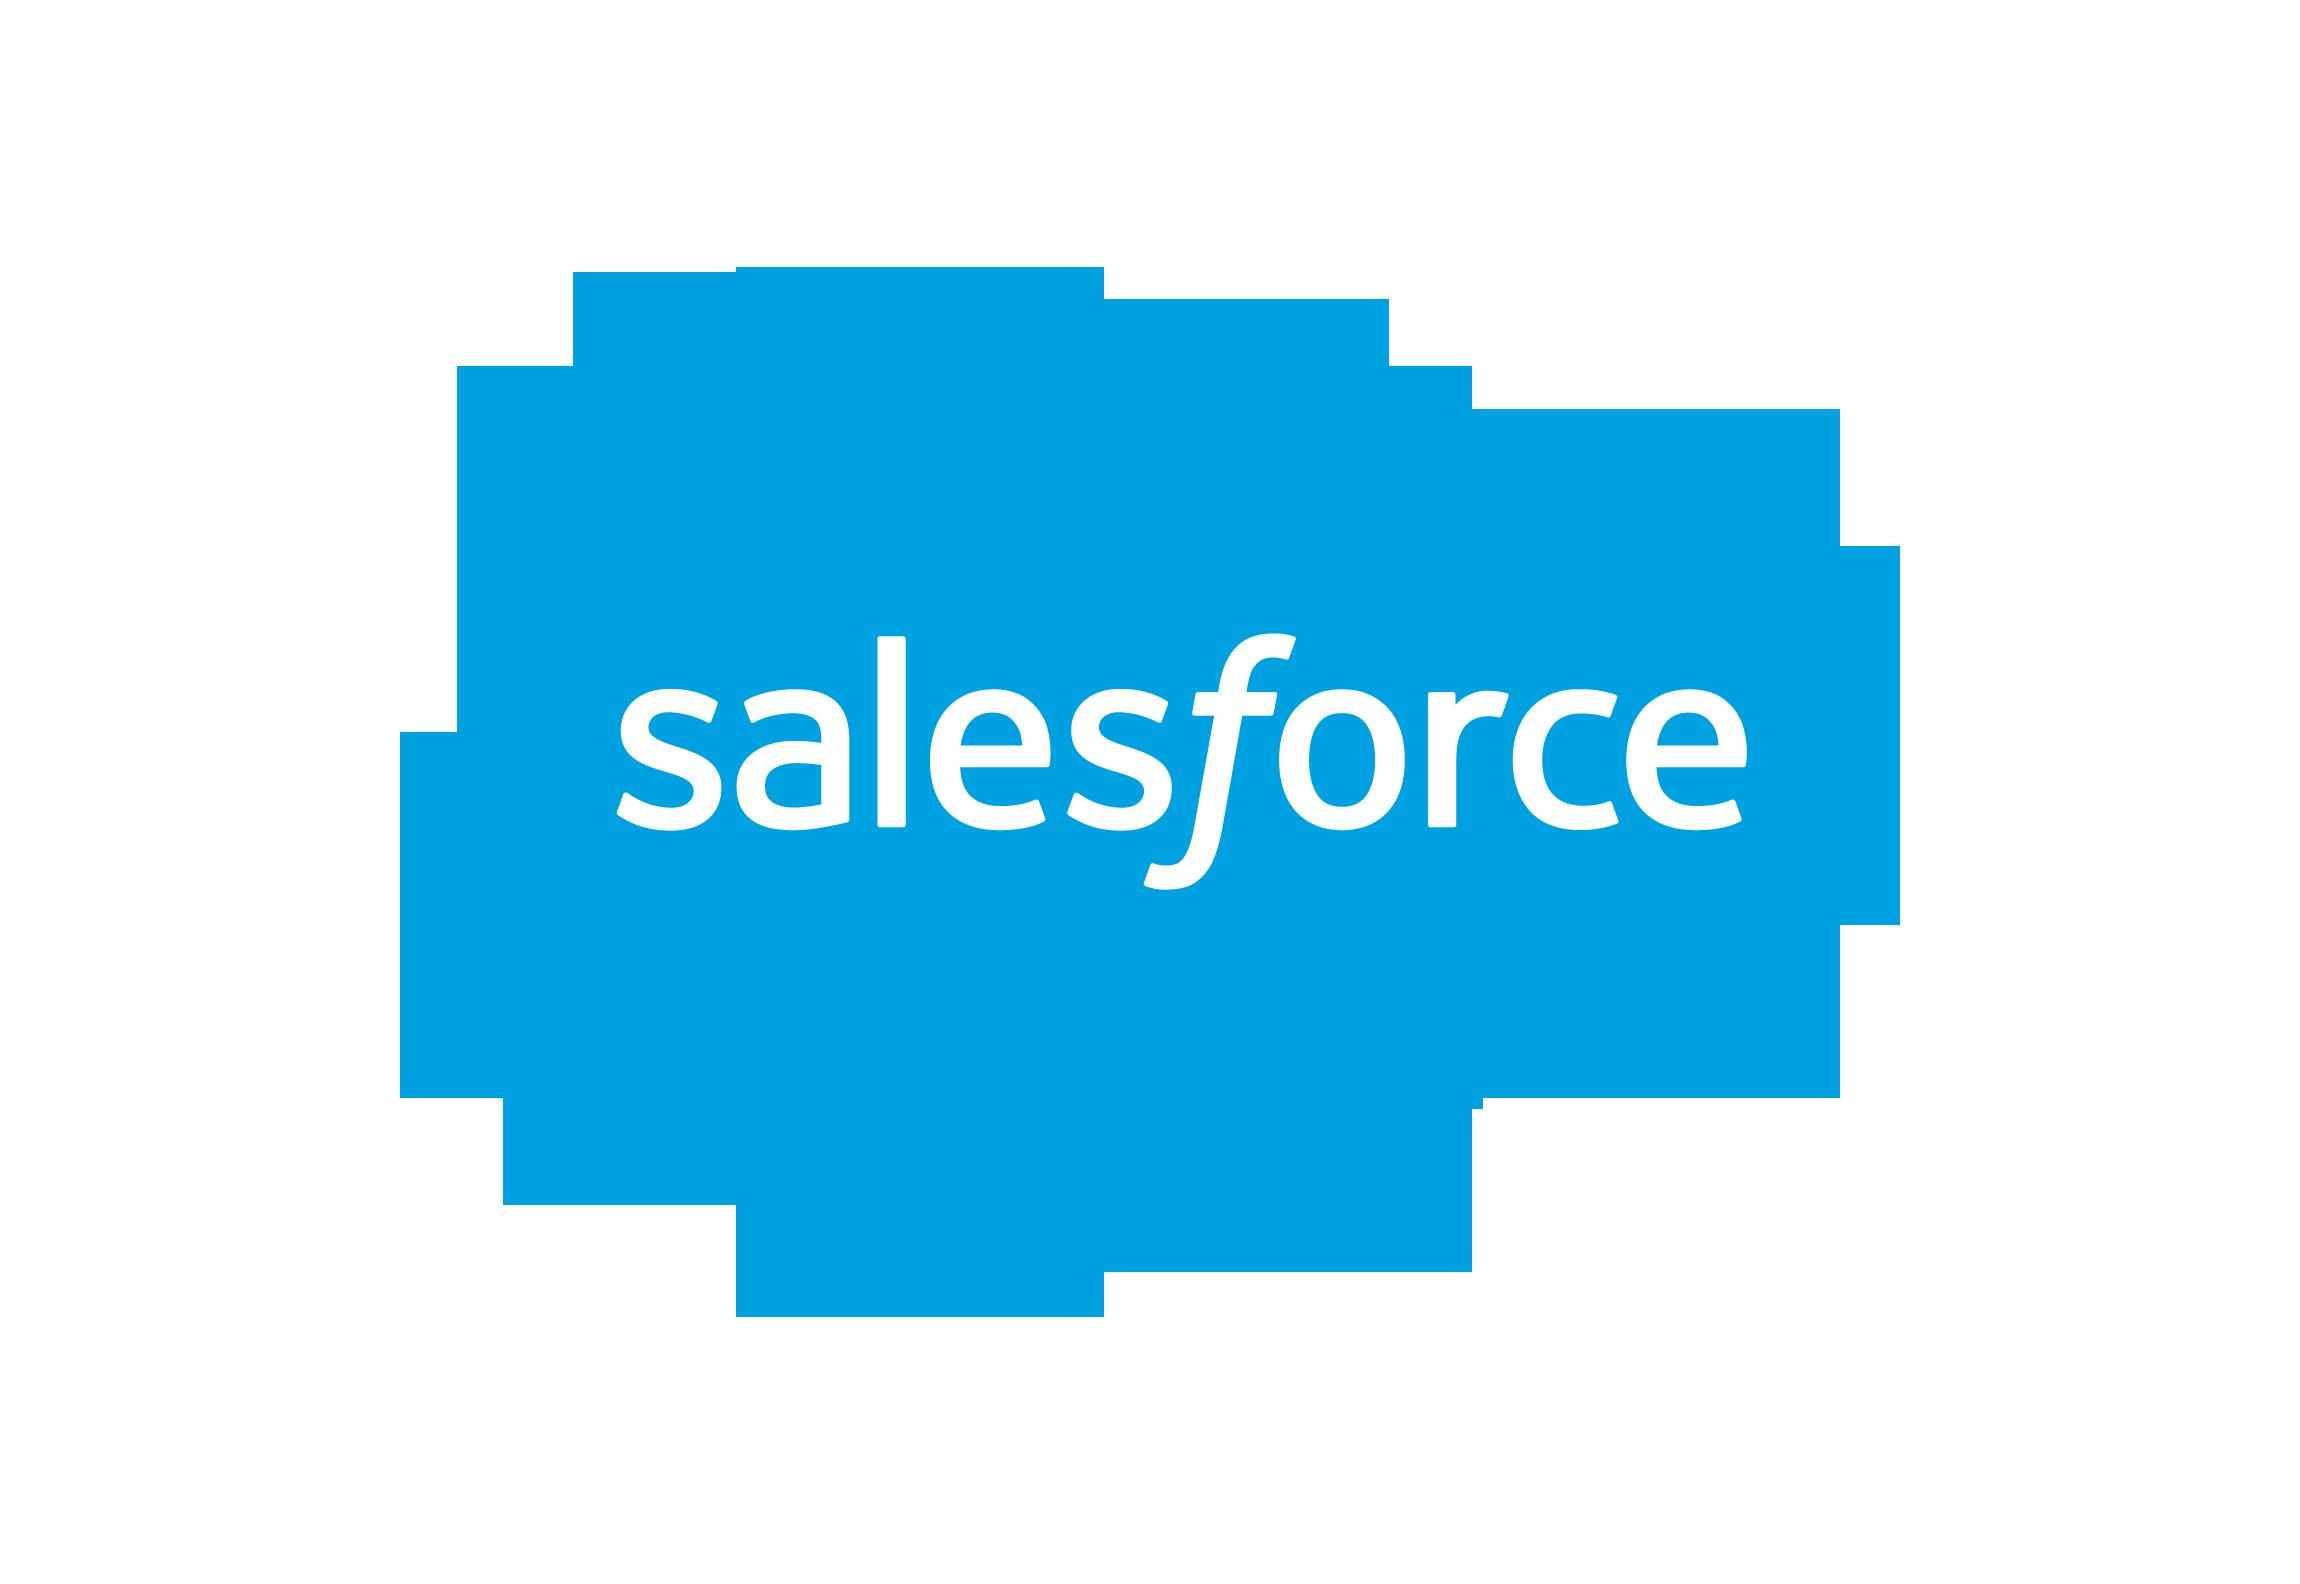 The Salesforce blue cloud logo.